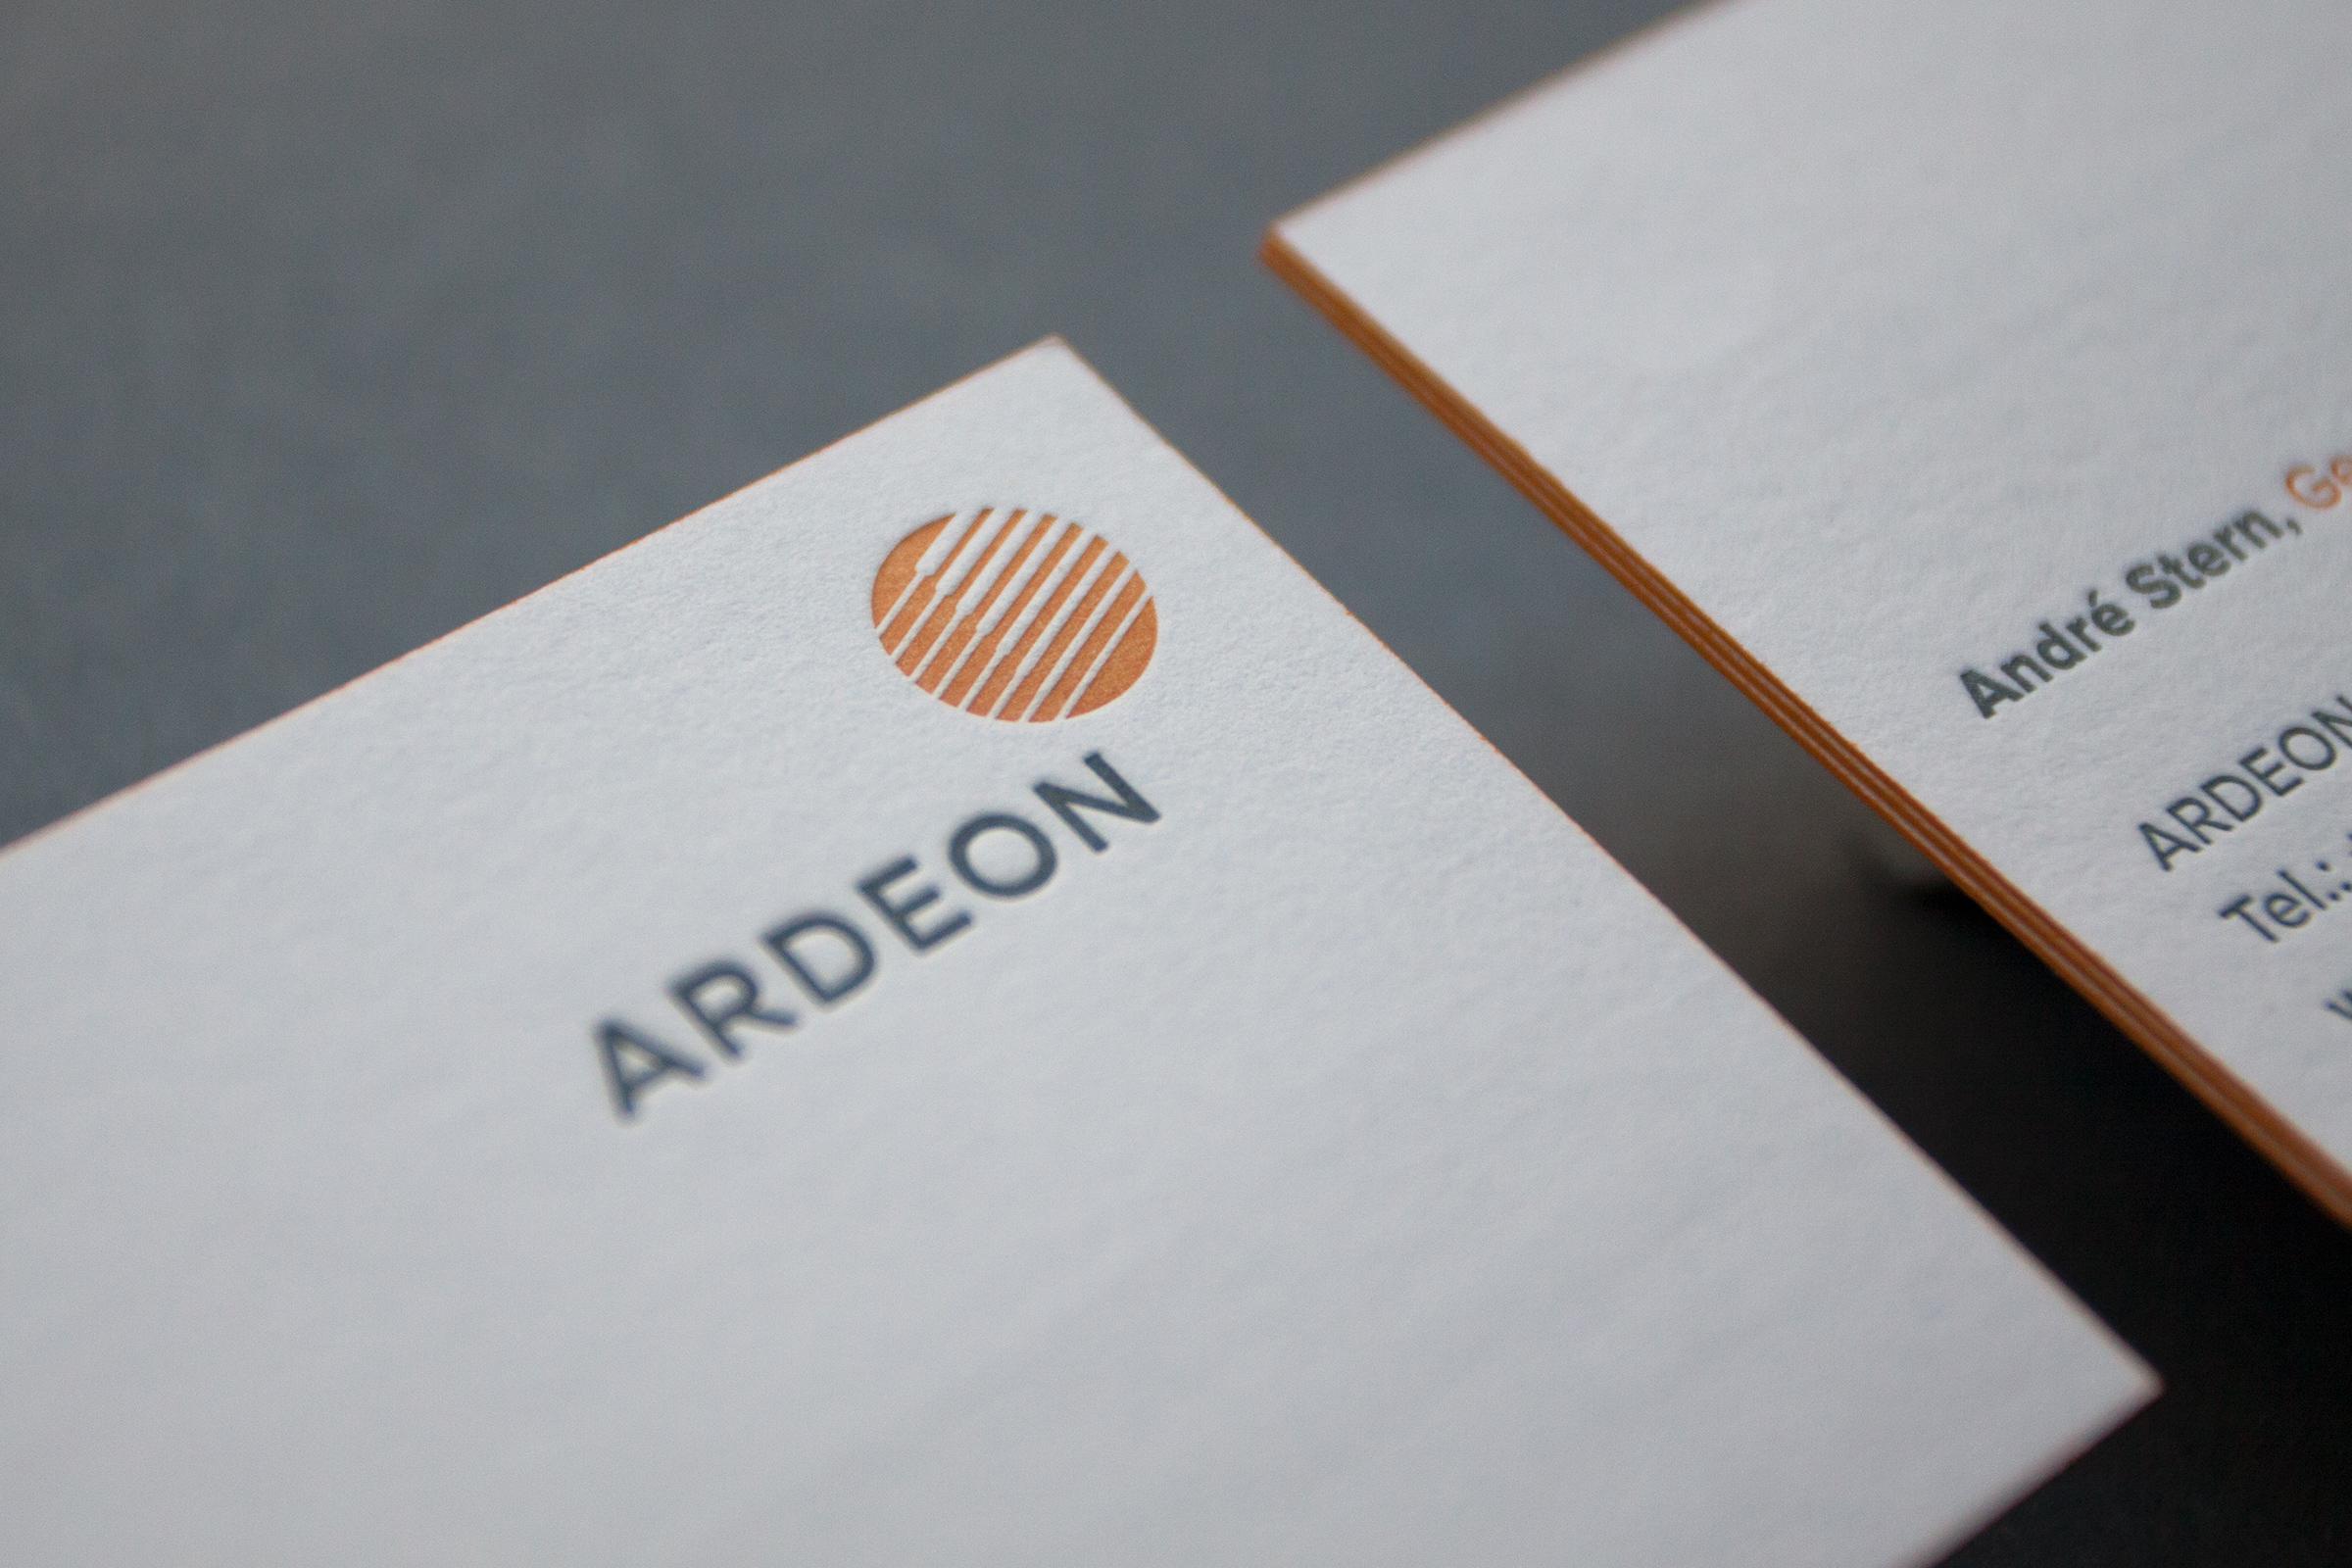 ardeon-bueroink-logo_2968